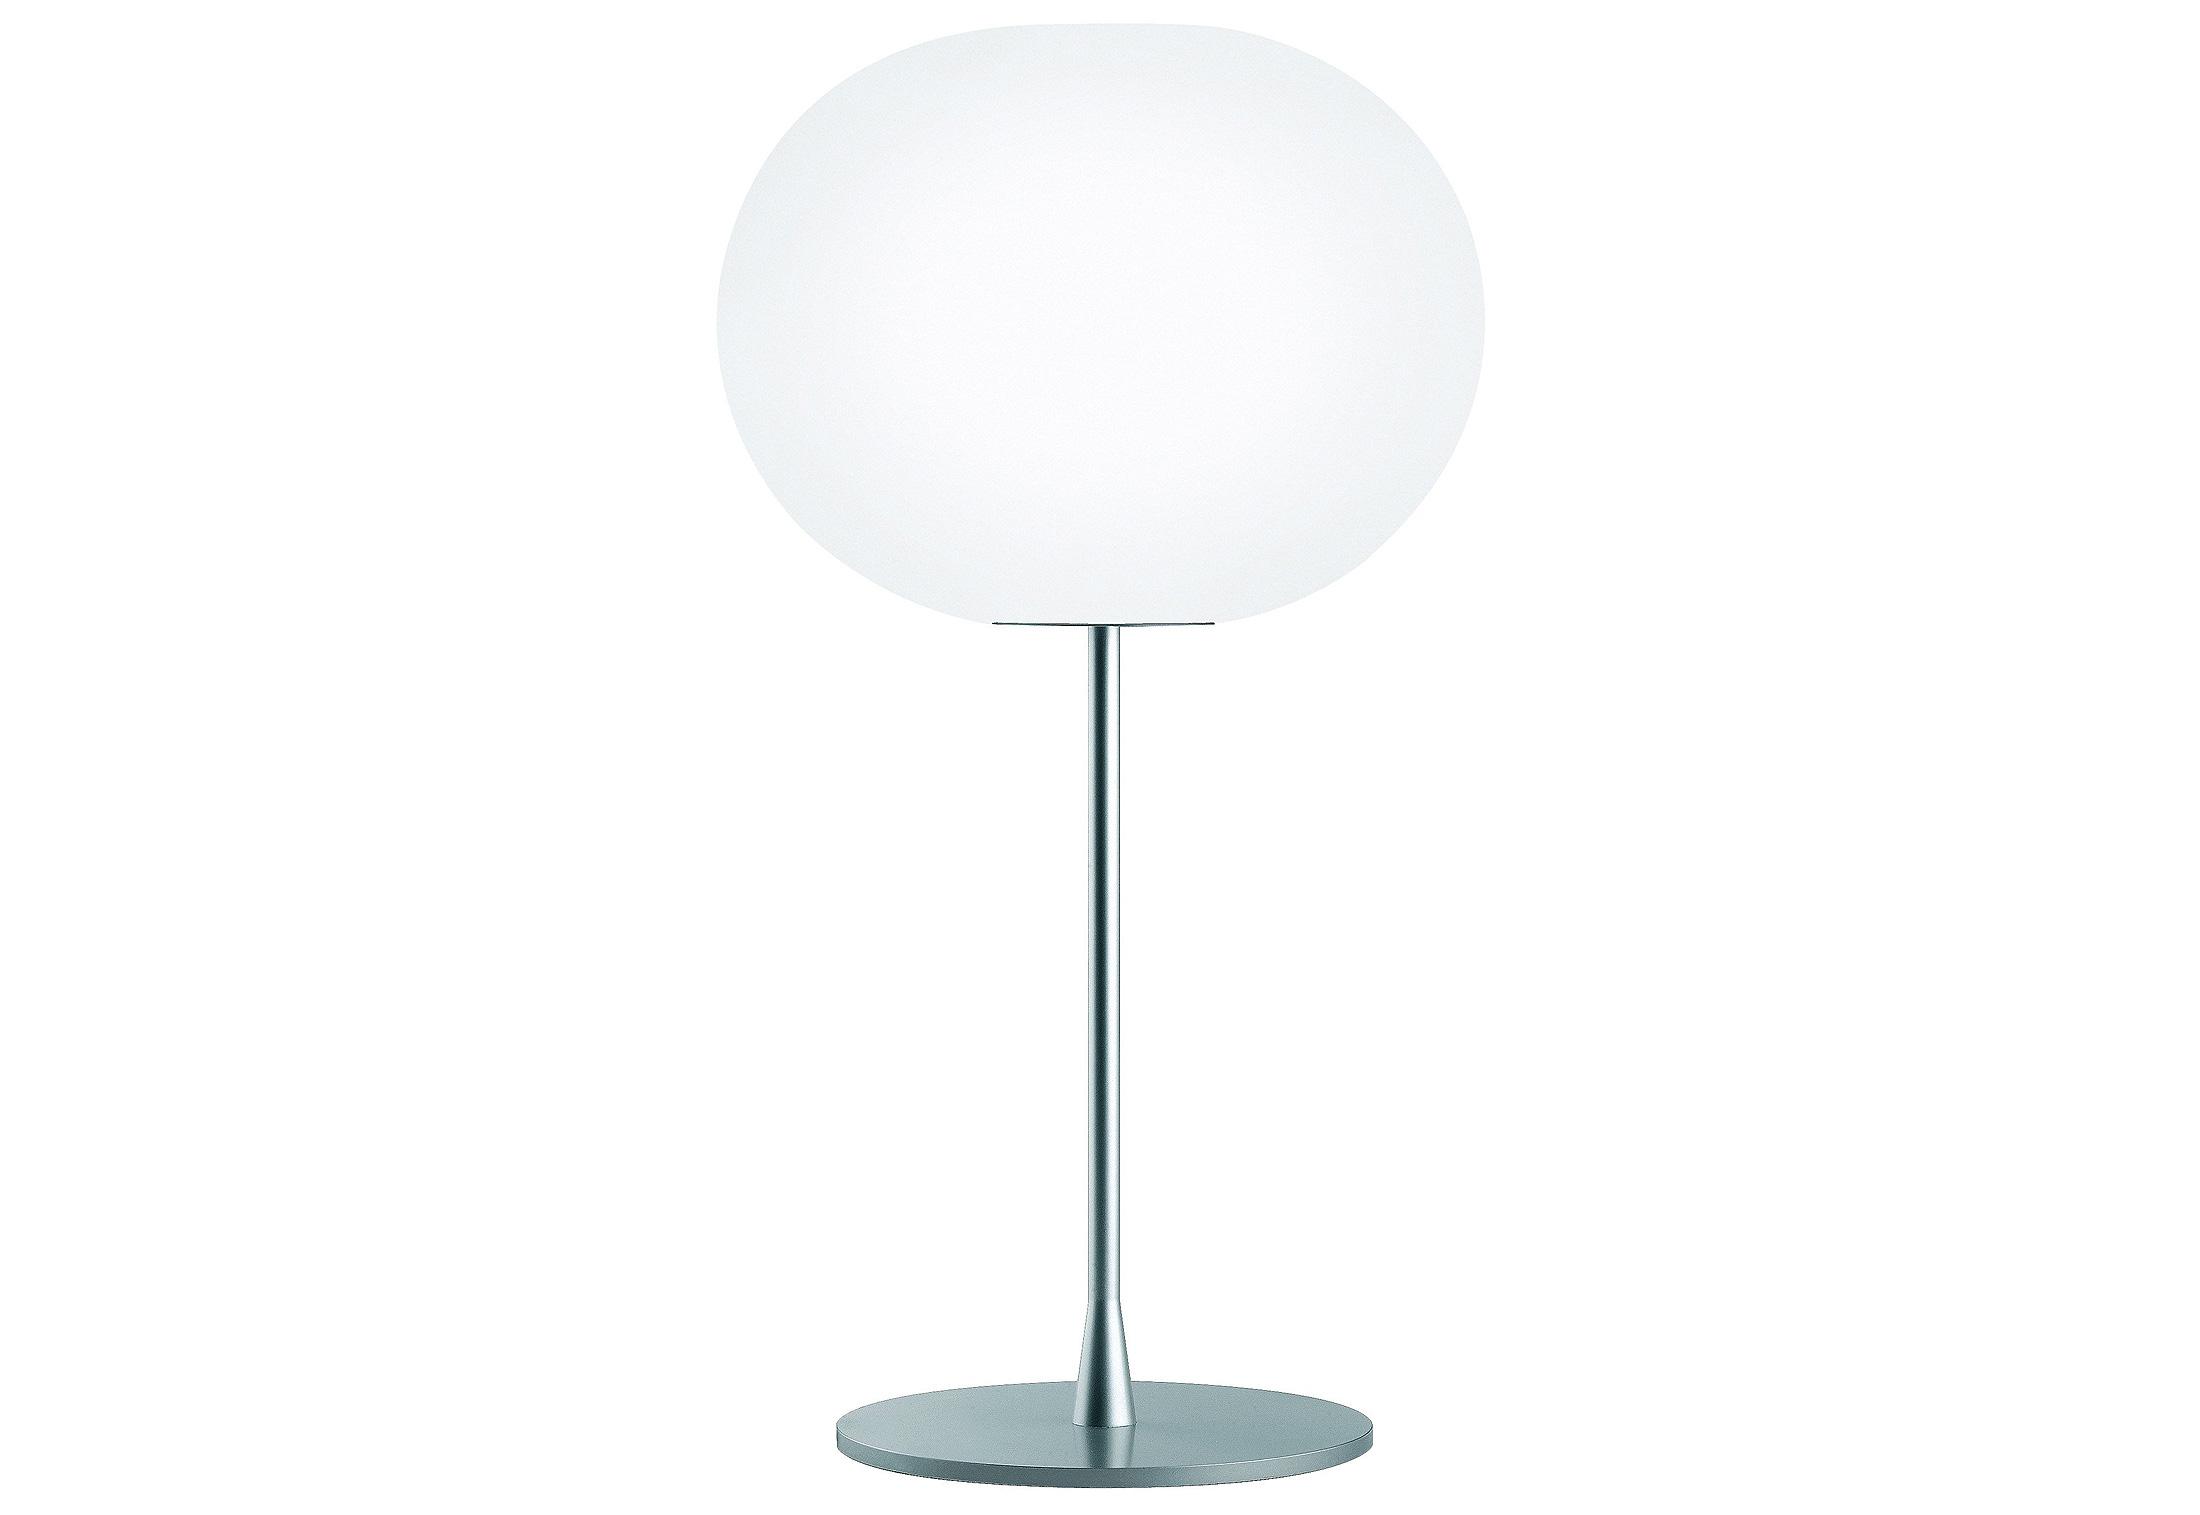 glo-ball-t1t2-table-lamp-2 Elegantes Flos Glo Ball S Dekorationen